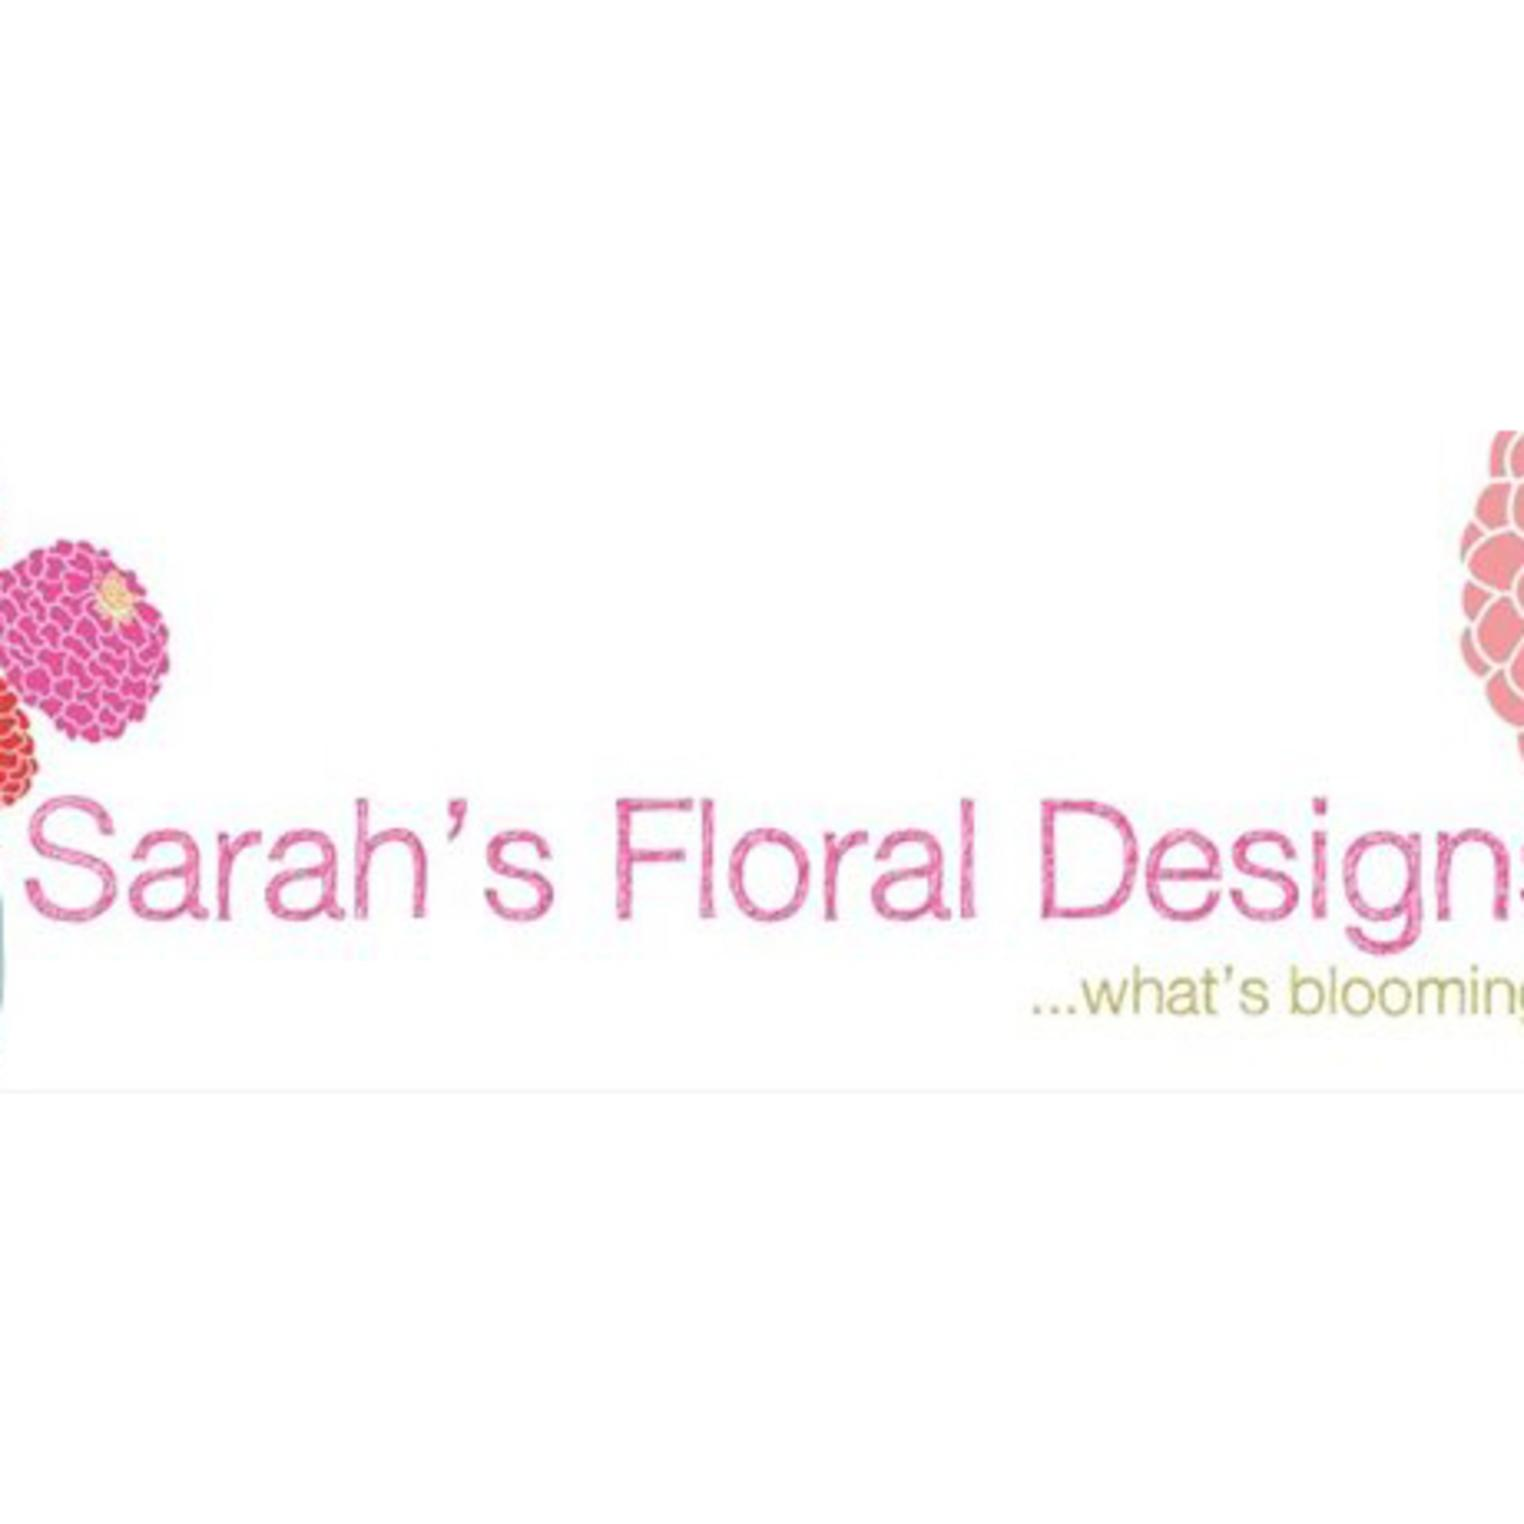 Sarah's Floral Designs